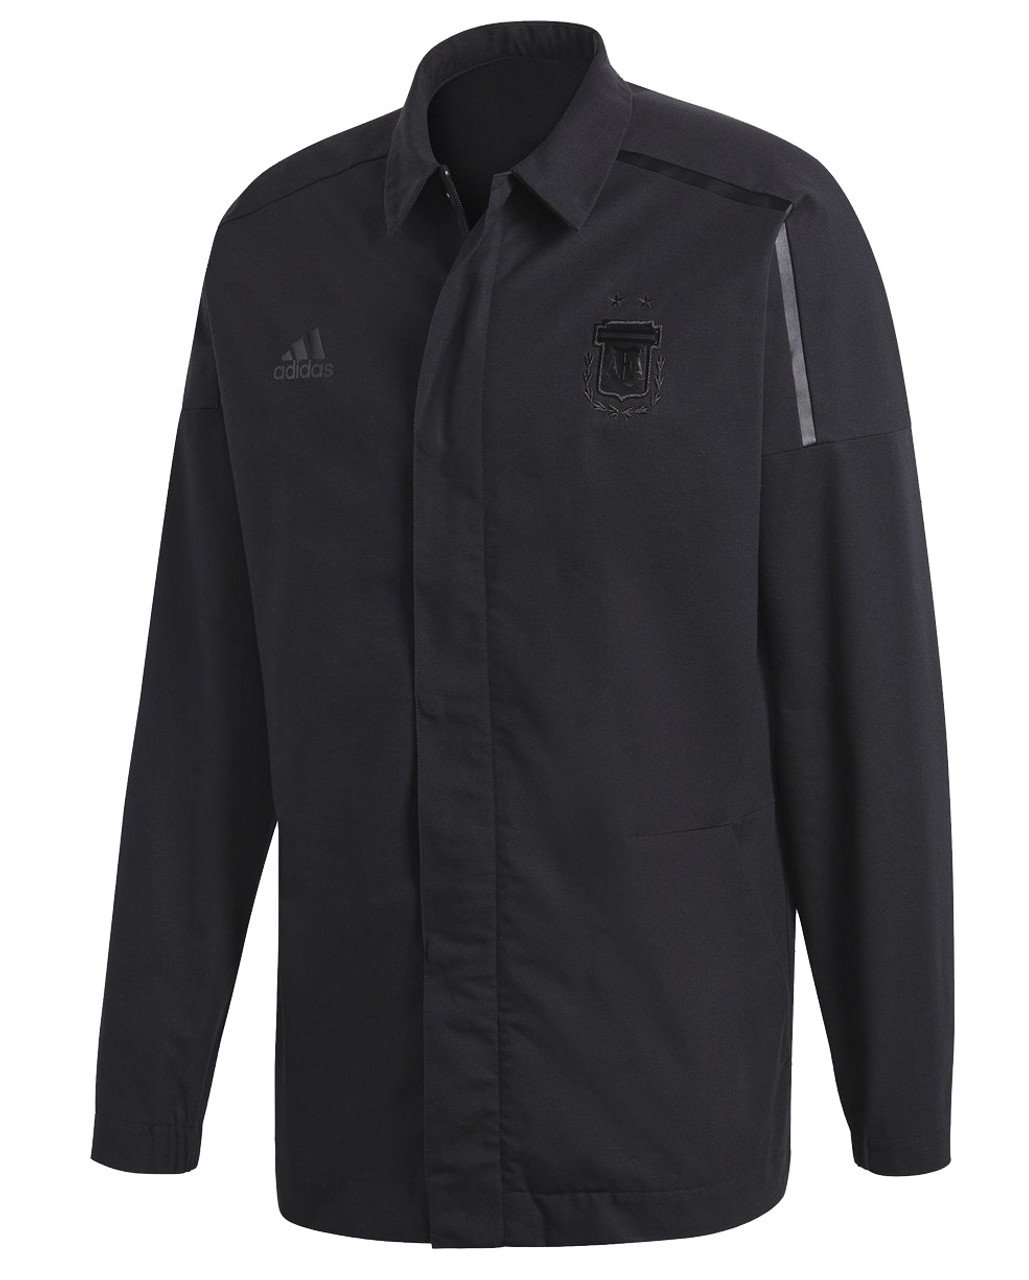 8a63e22f2 Adidas Argentina Z.N.E Anthem Jacket - Black (52818) - ohp soccer